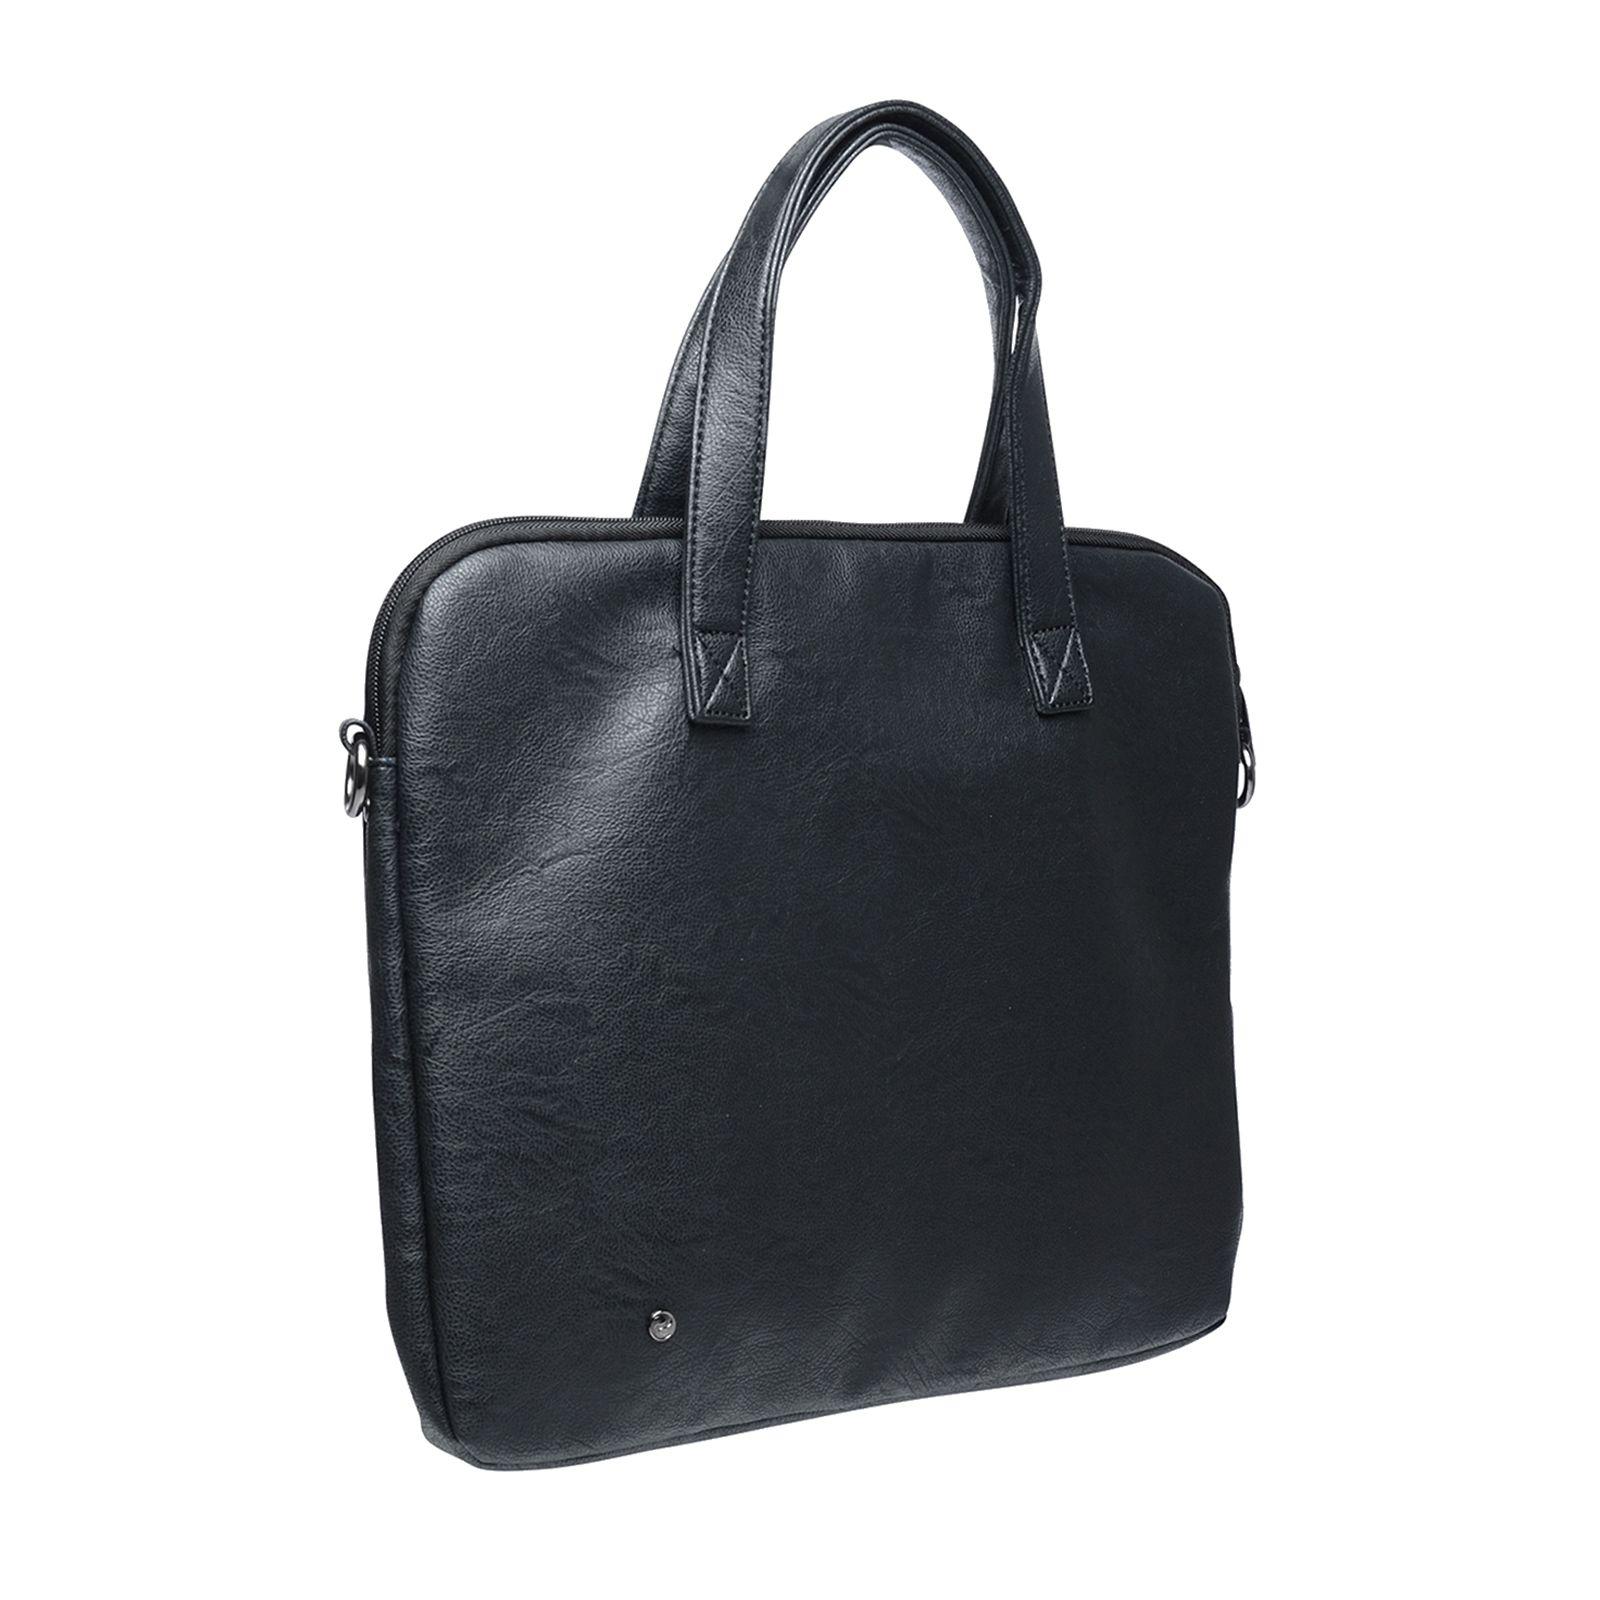 Sac ordinateur portable noir sacs - Tuto sac ordinateur portable ...